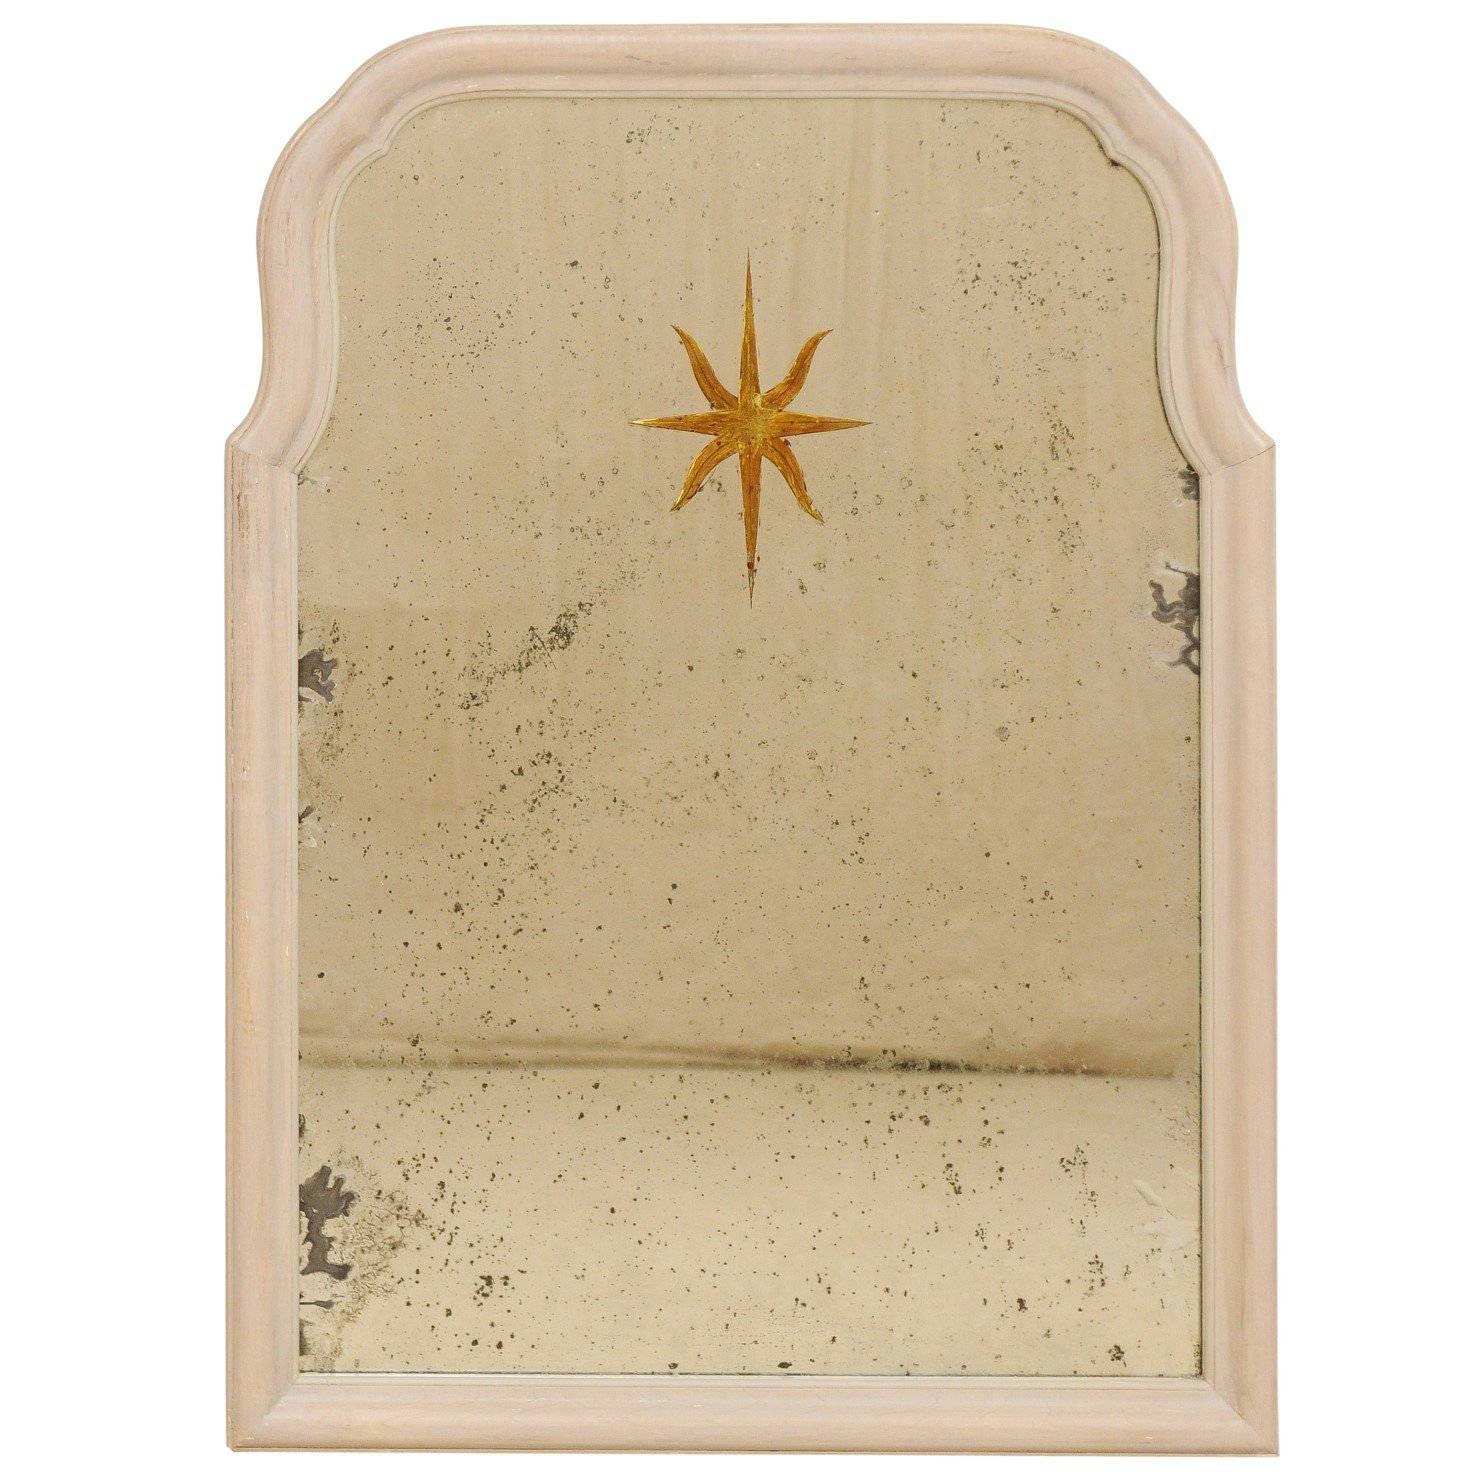 Sunburst Églomisé Antiqued Wall Mirror with Neutral Painted Cream Surround